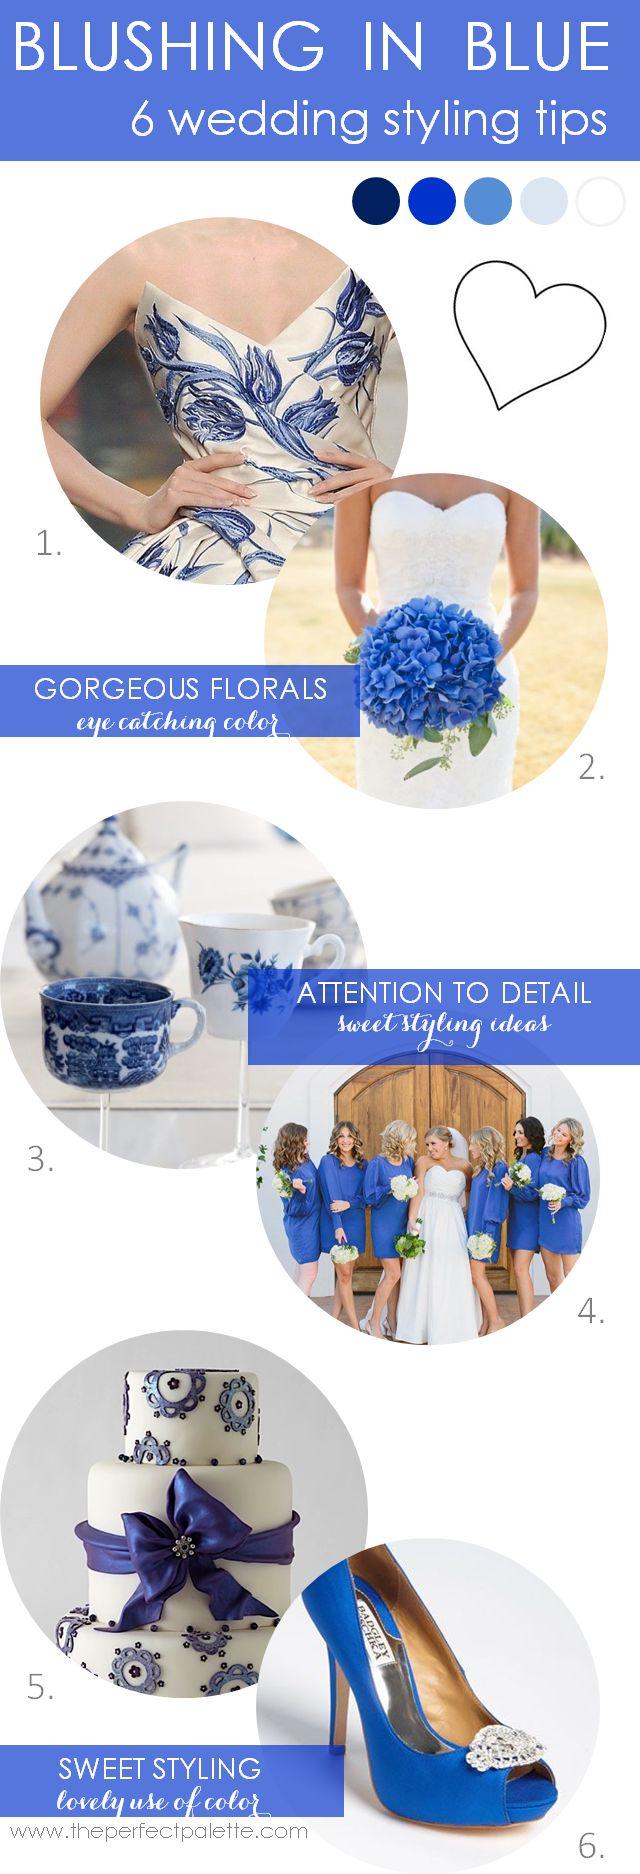 126 best Theme Wedding Ideas images on Pinterest | Birthdays, Fiesta ...